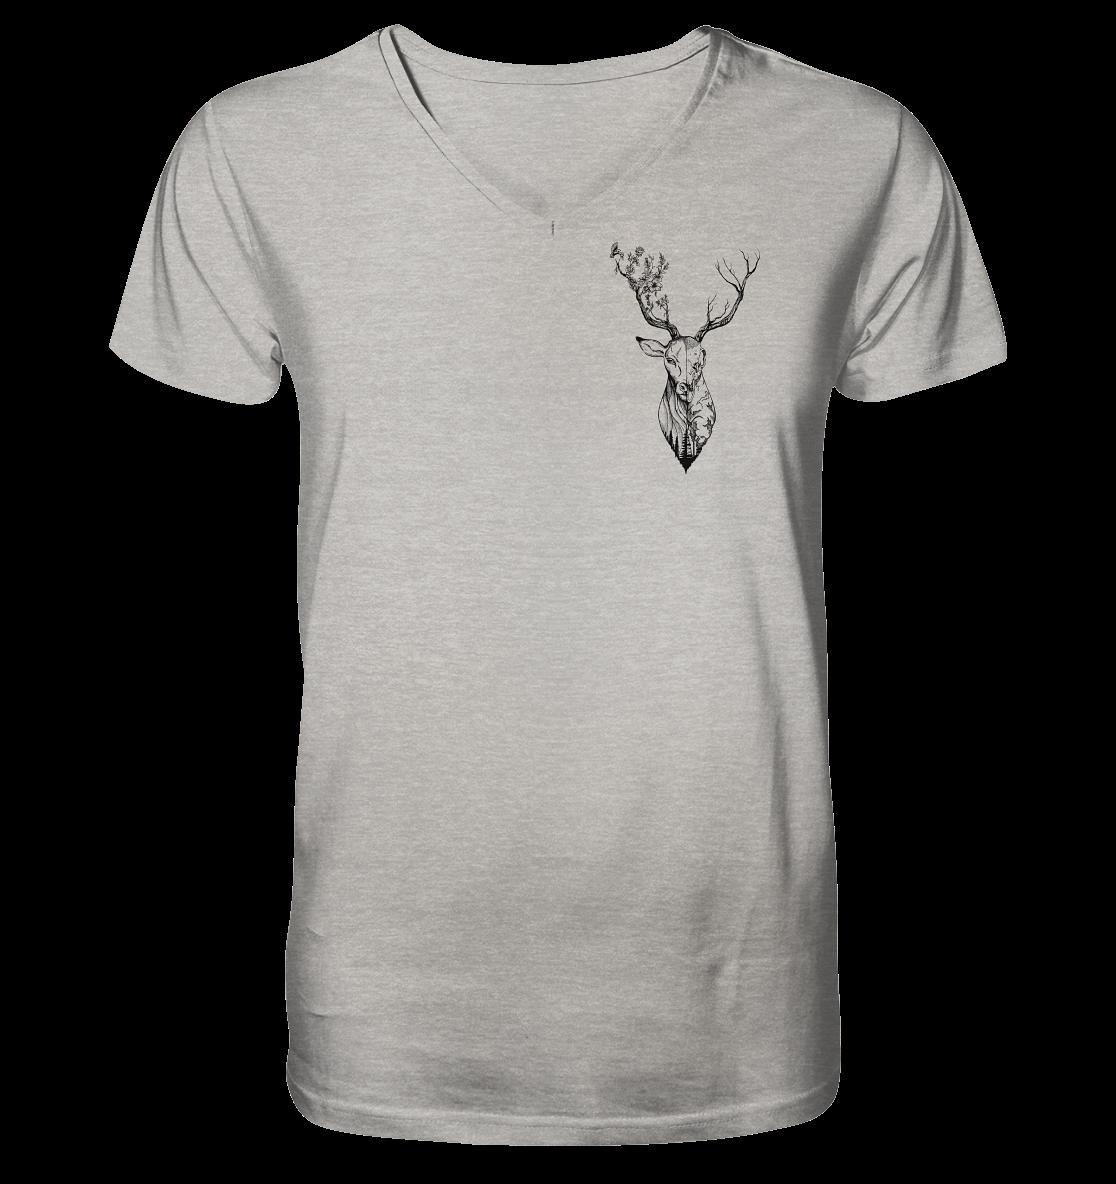 front-mens-organic-v-neck-shirt-c2c1c0-1116x-5.png